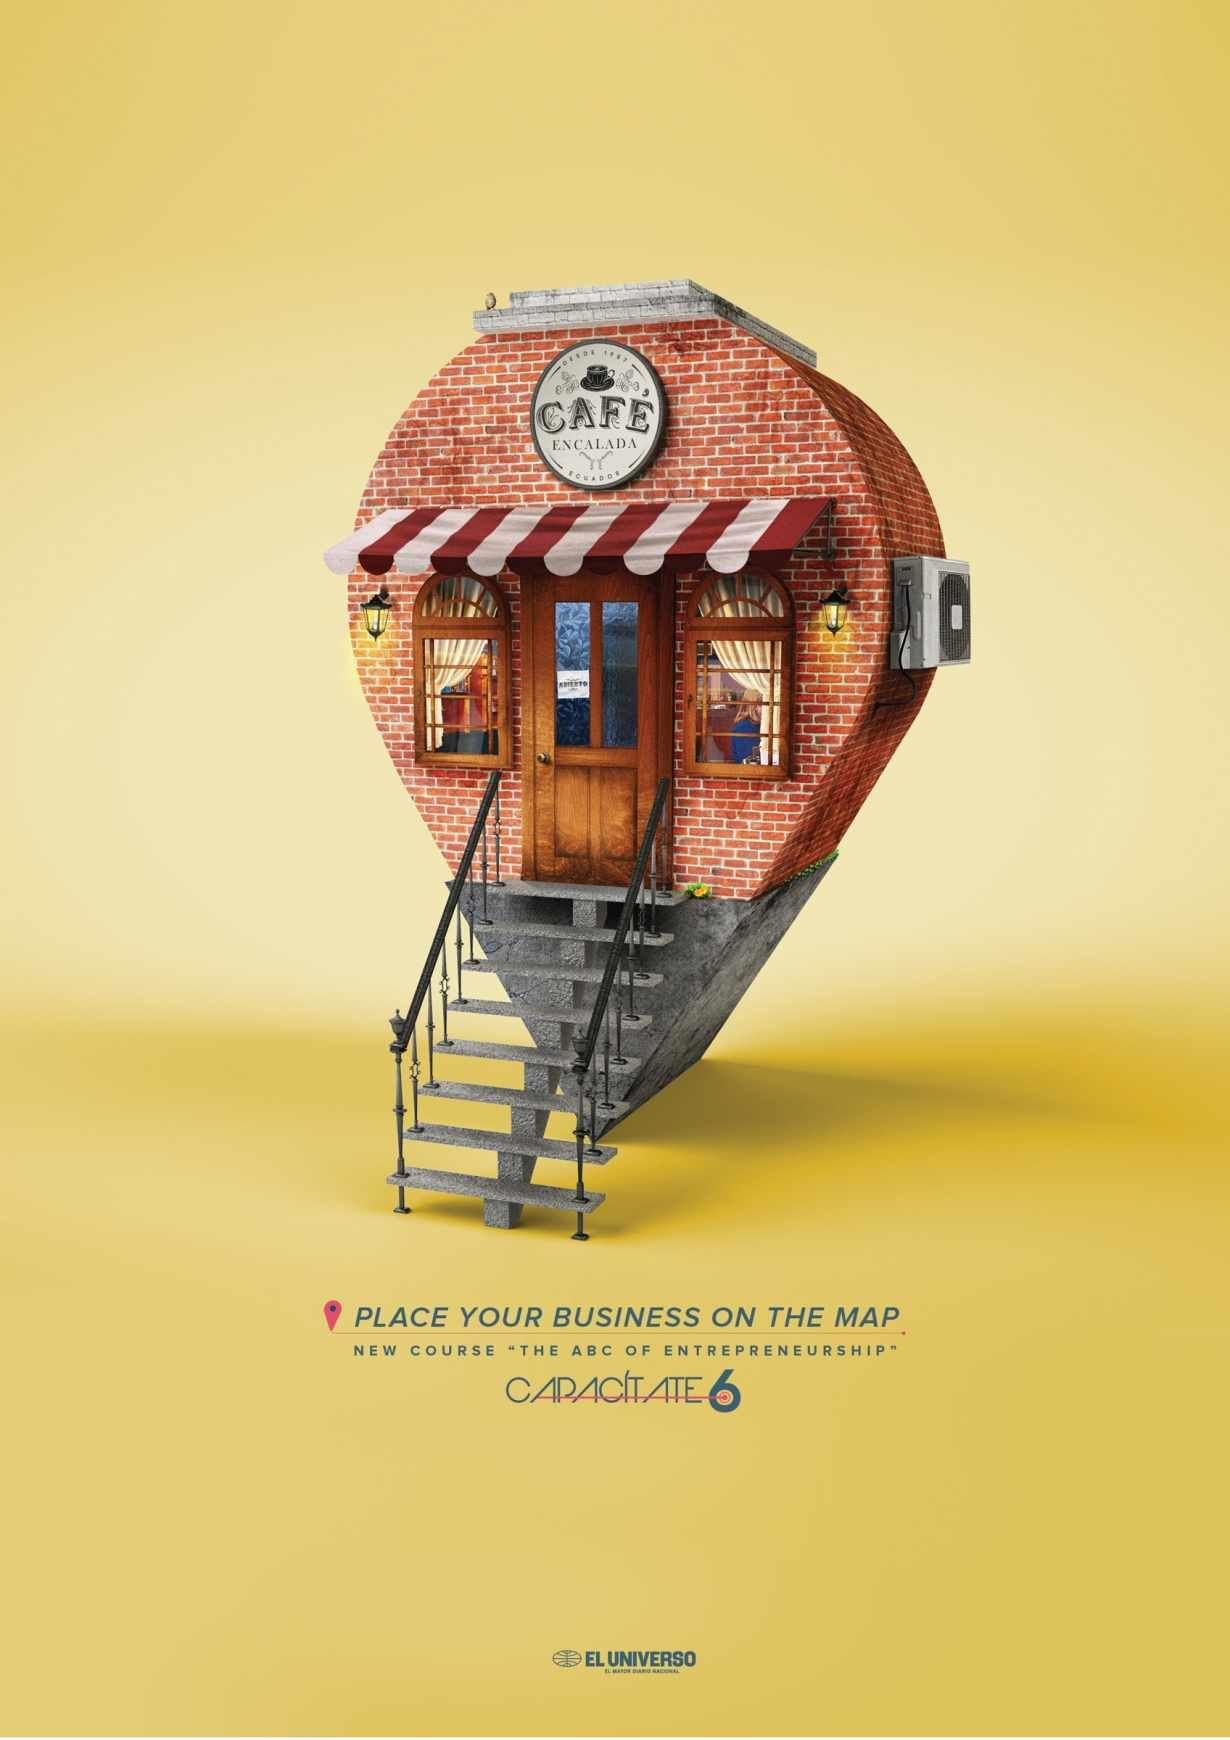 3 poster design tips - 30 Advertisement Design Tips That Turn Heads Brilliant Case Studies Design School